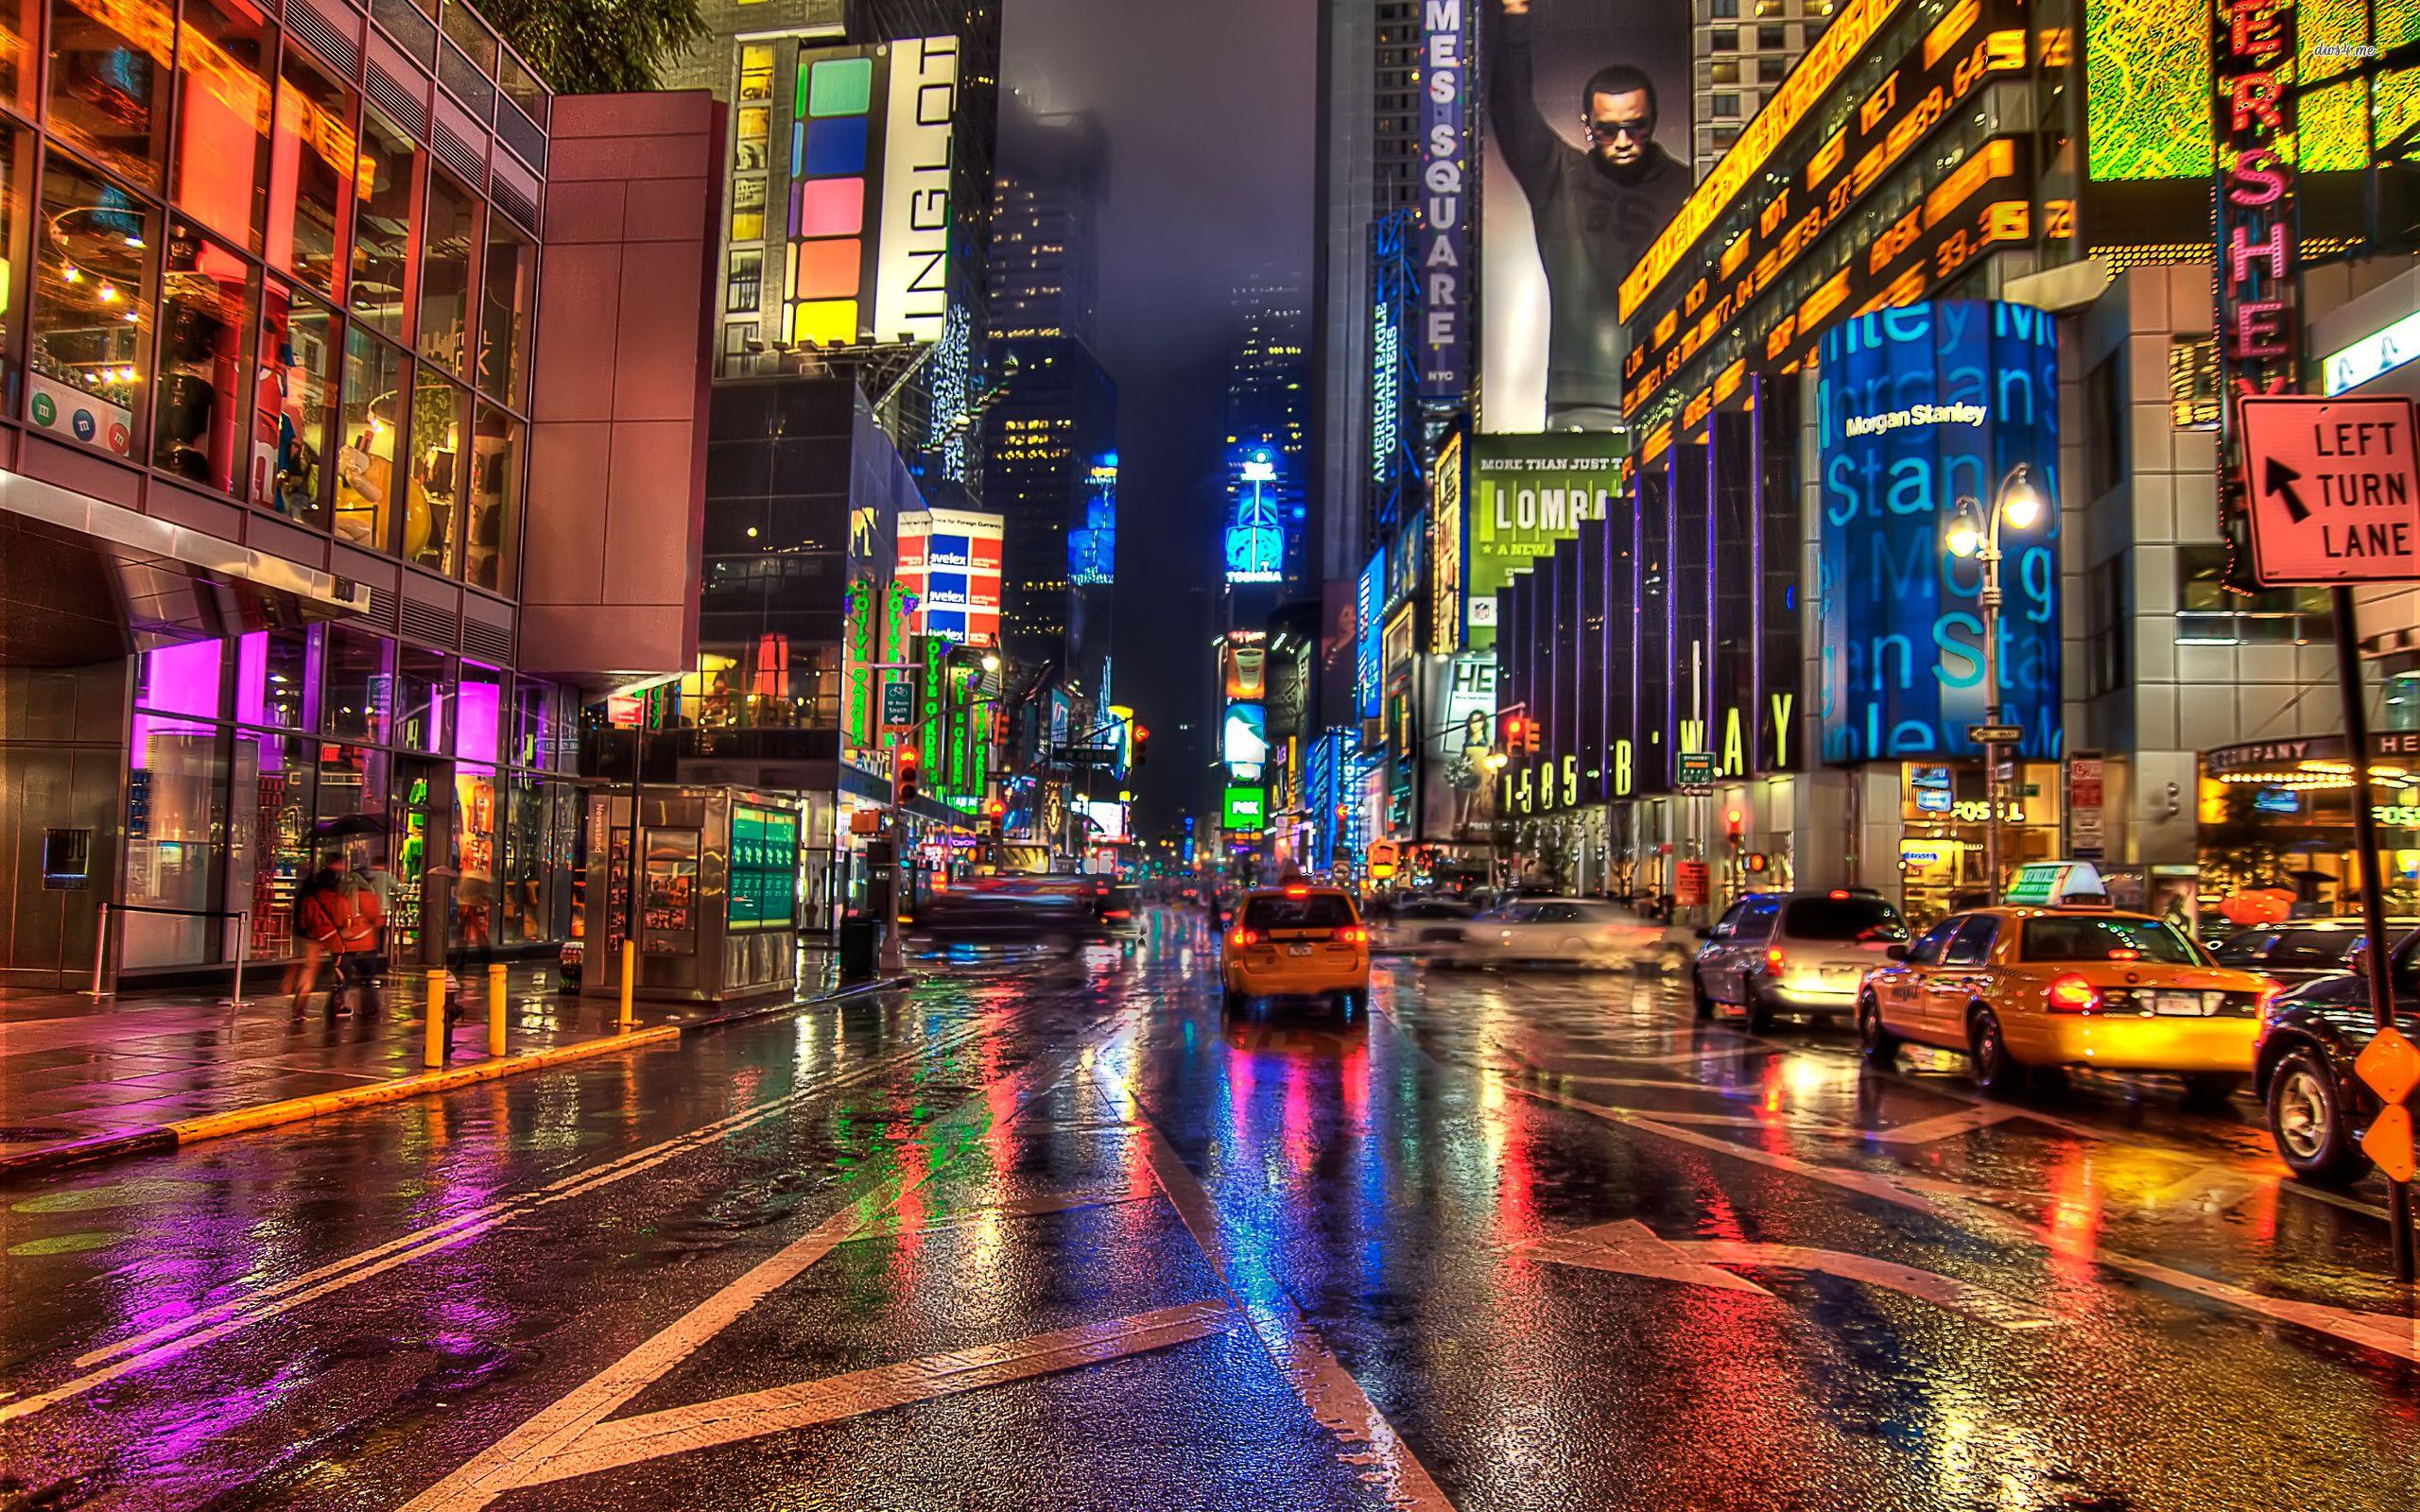 new-york-city-street-wallpaper-4 (jpeg image, 2560 × 1600 pixels